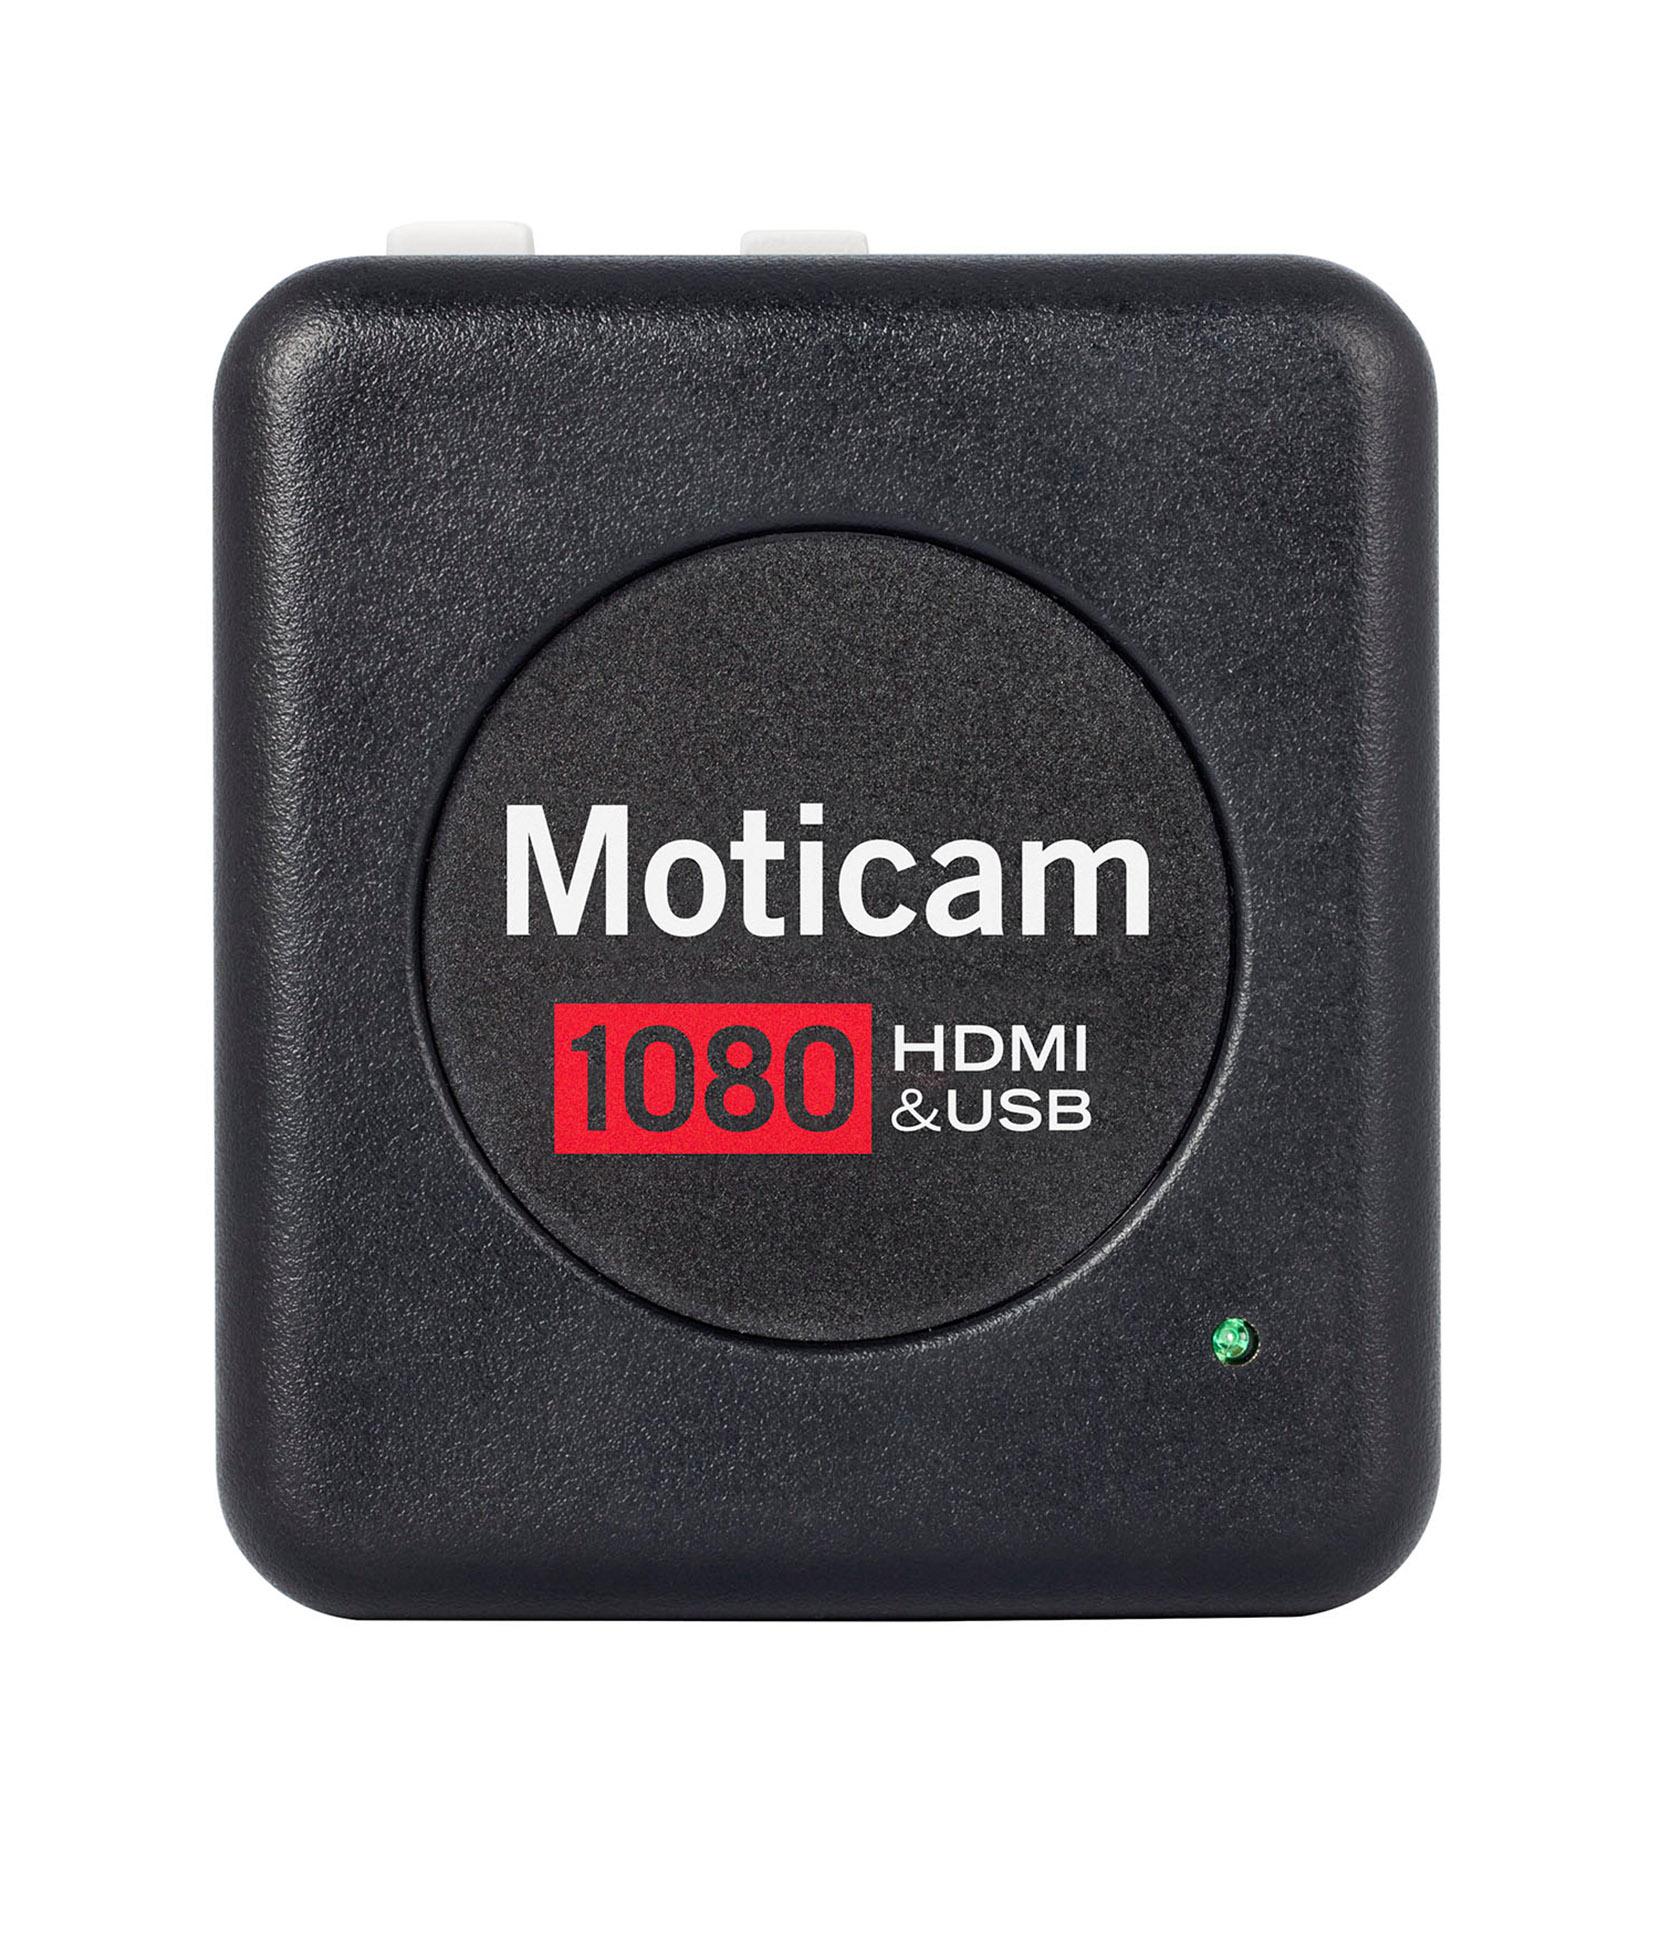 Moticam 1080 HD